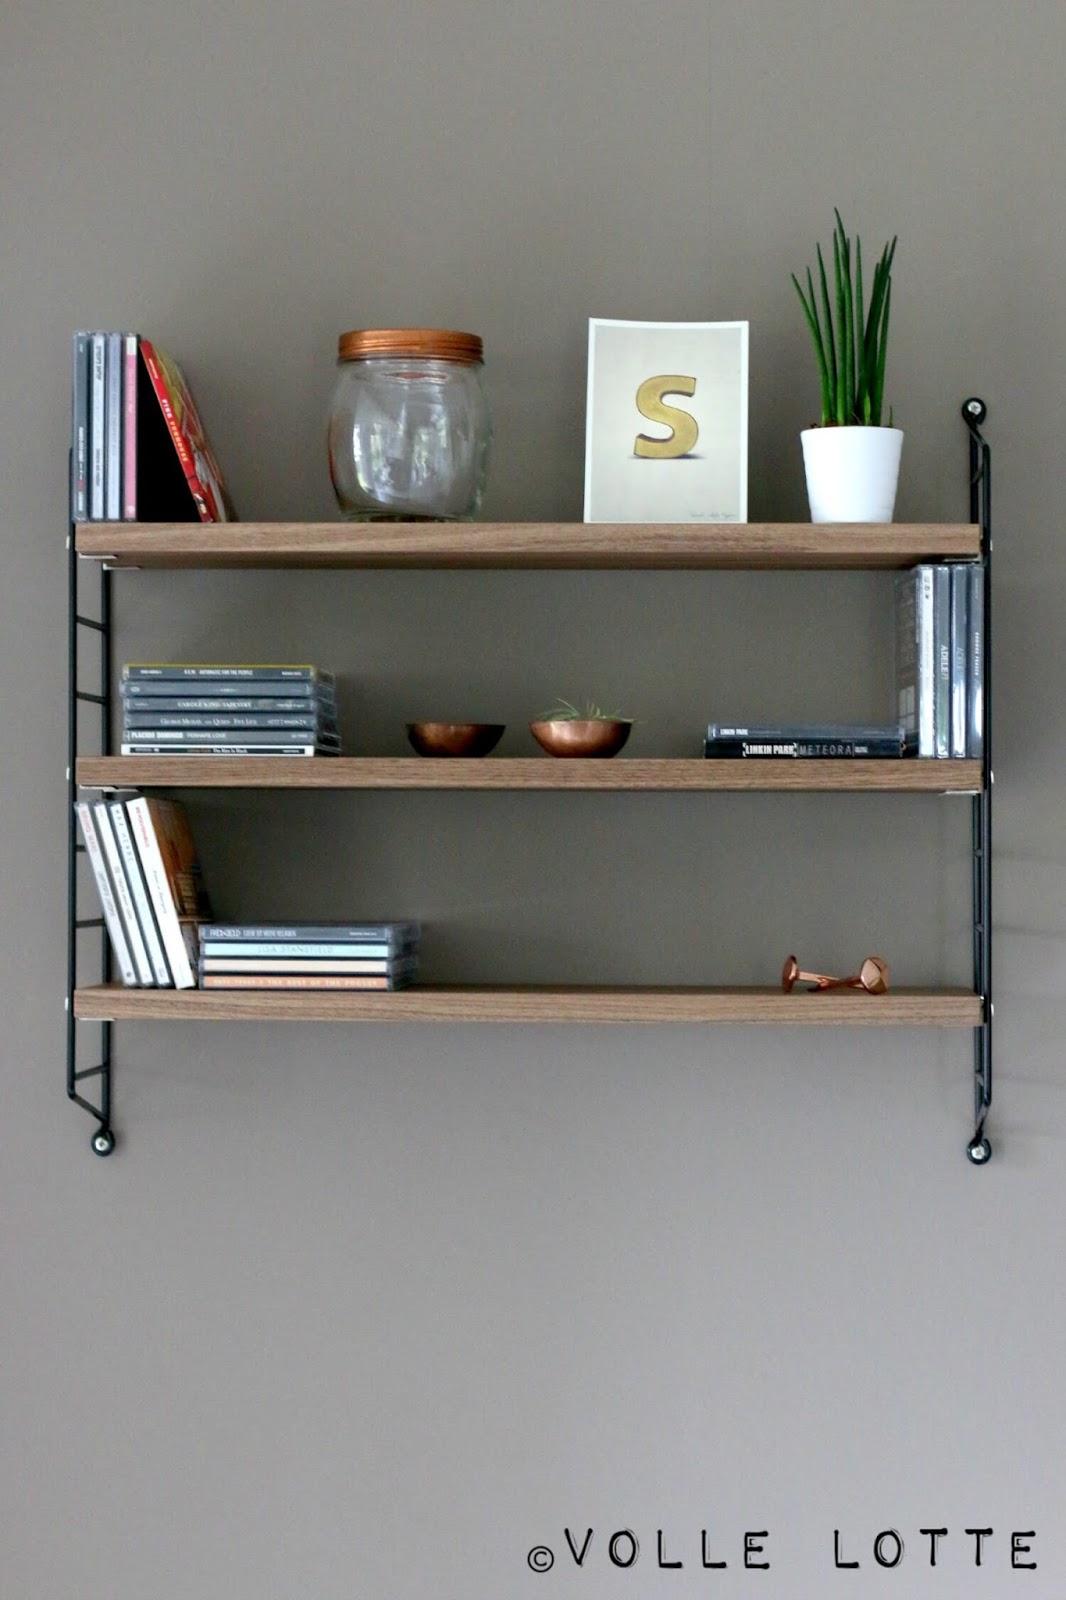 volle lotte food wine and travel. Black Bedroom Furniture Sets. Home Design Ideas